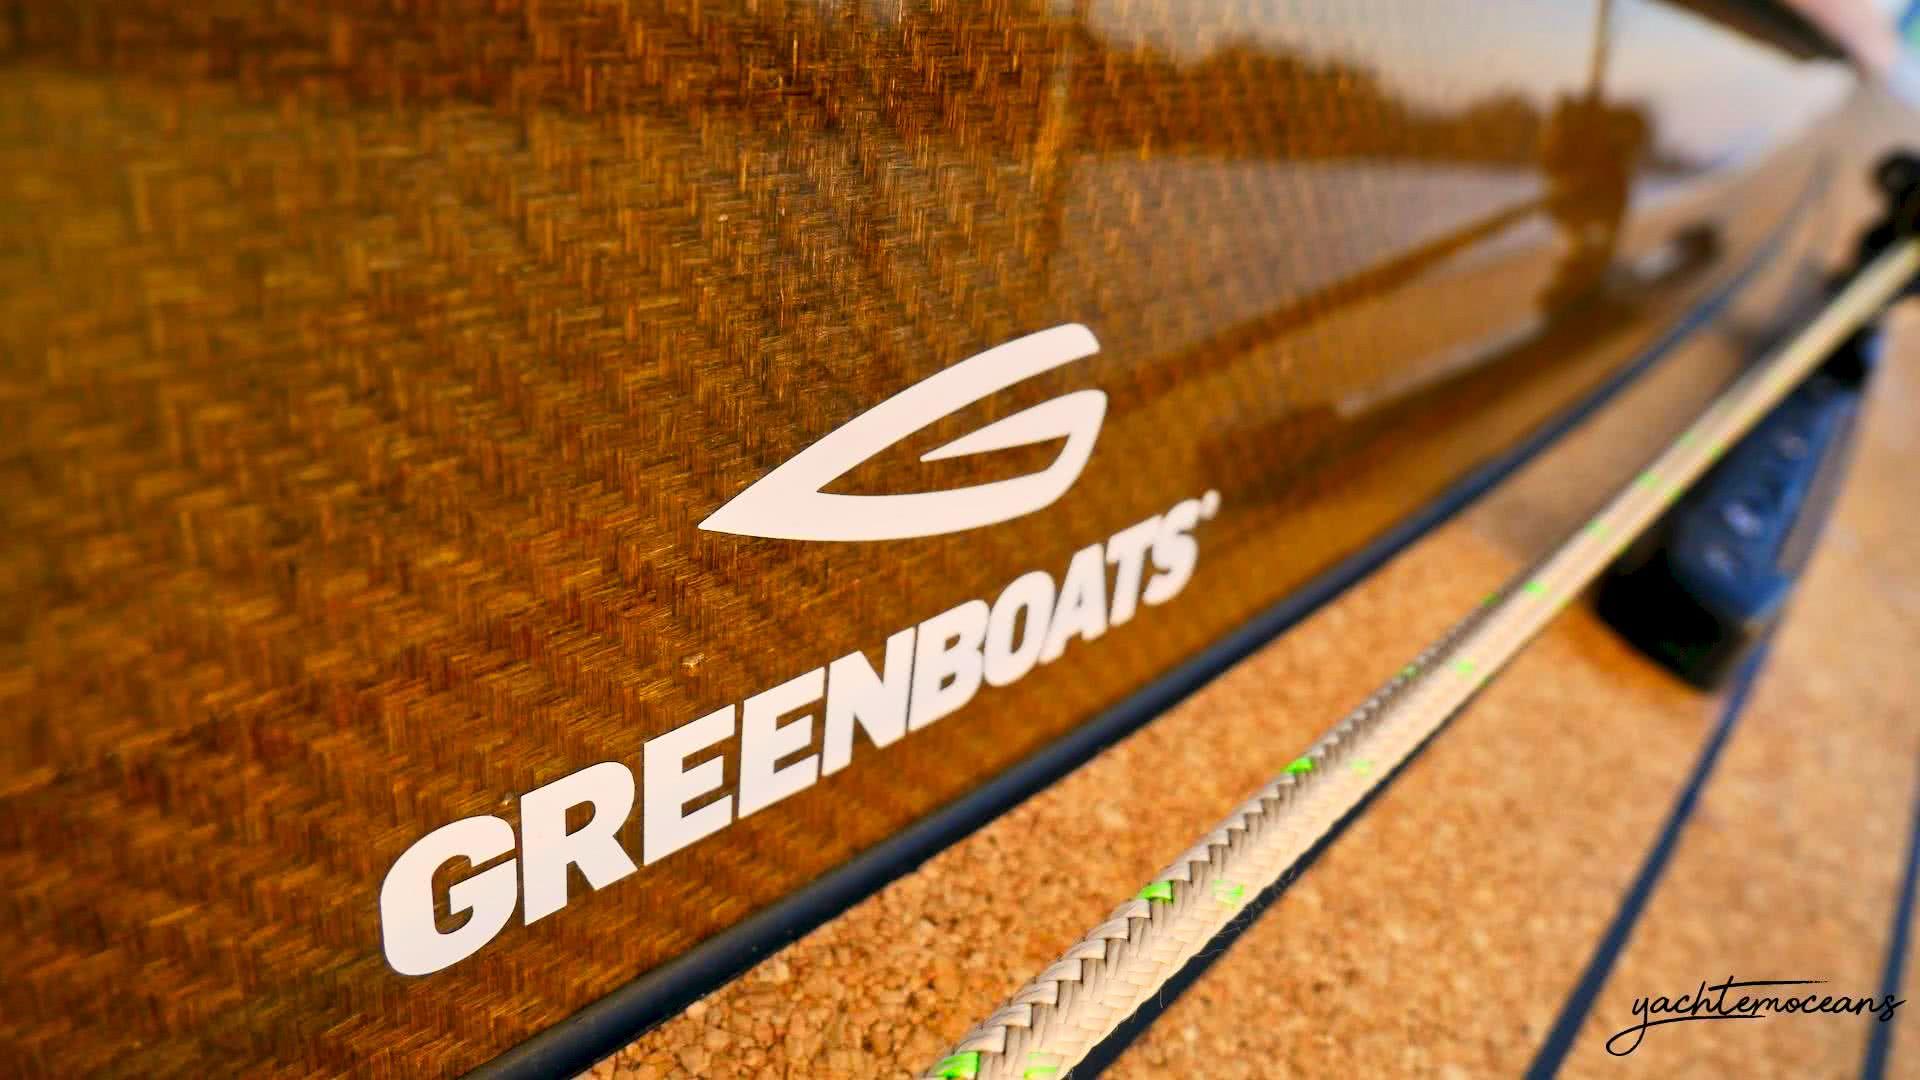 Flax 27 Daysailer Greenboats Bremen